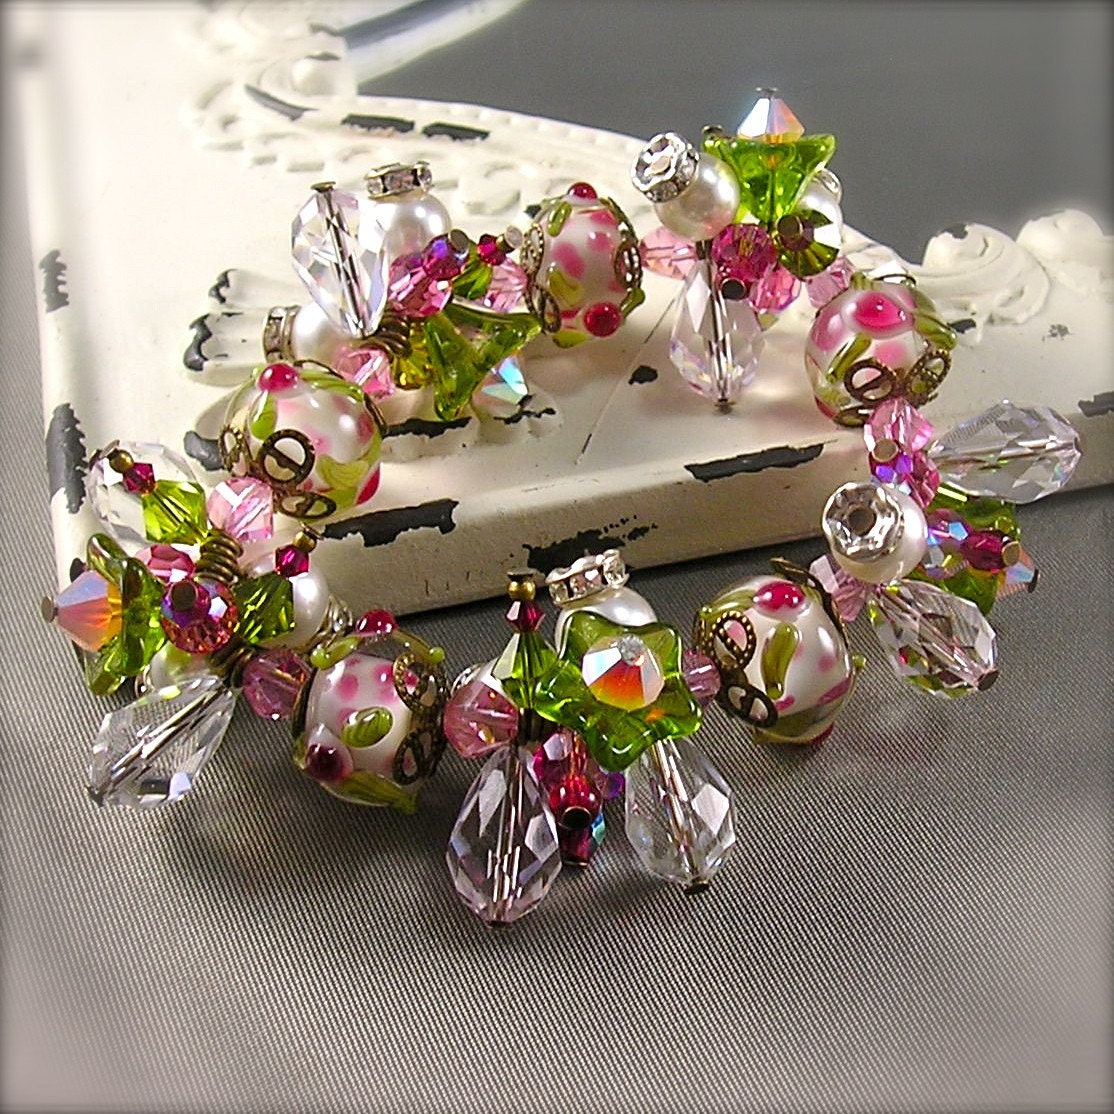 Spring Fling stretch charm bracelet